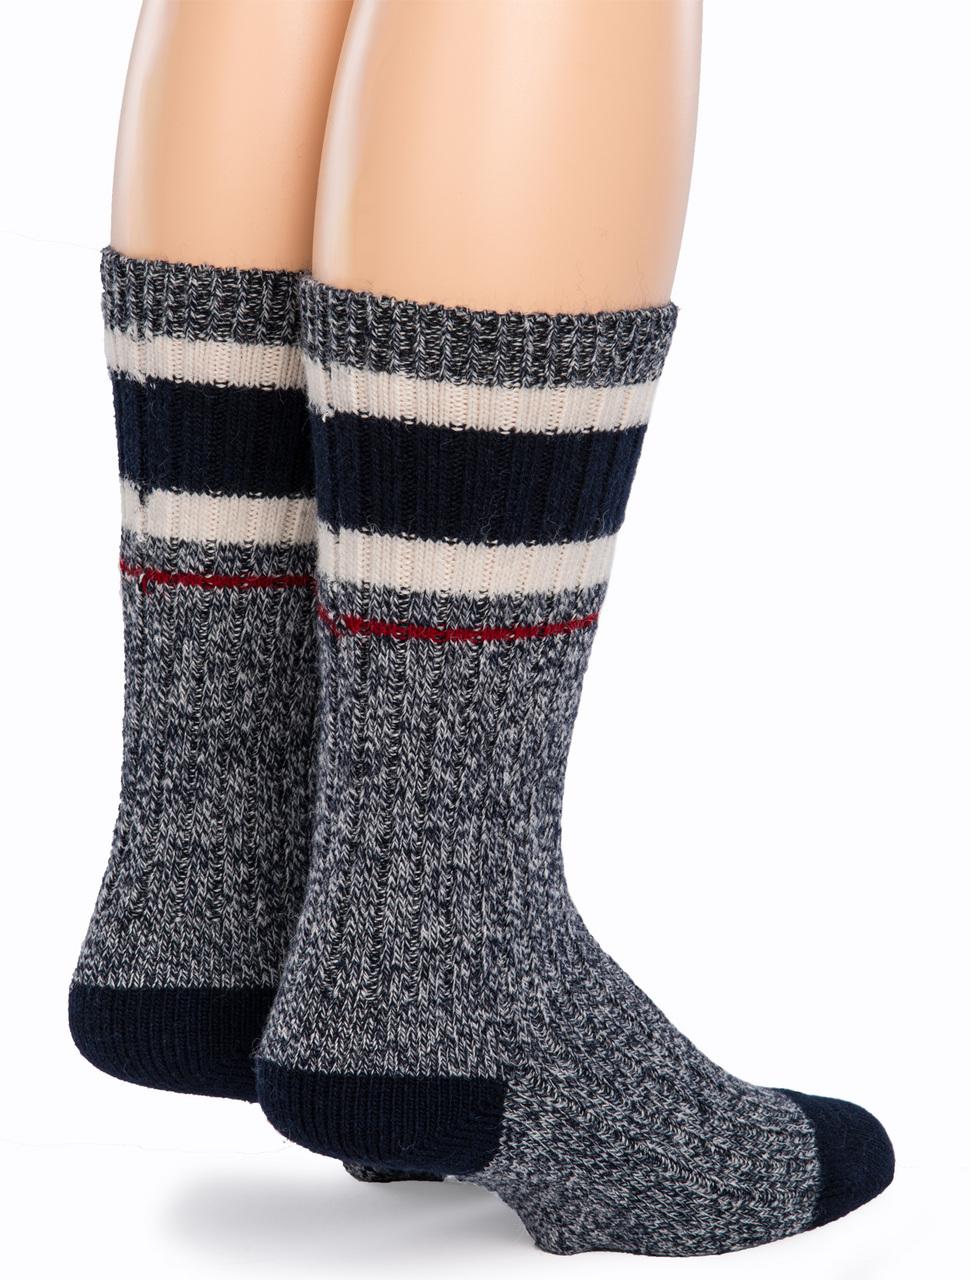 Old School Athletic Striped Socks - Back